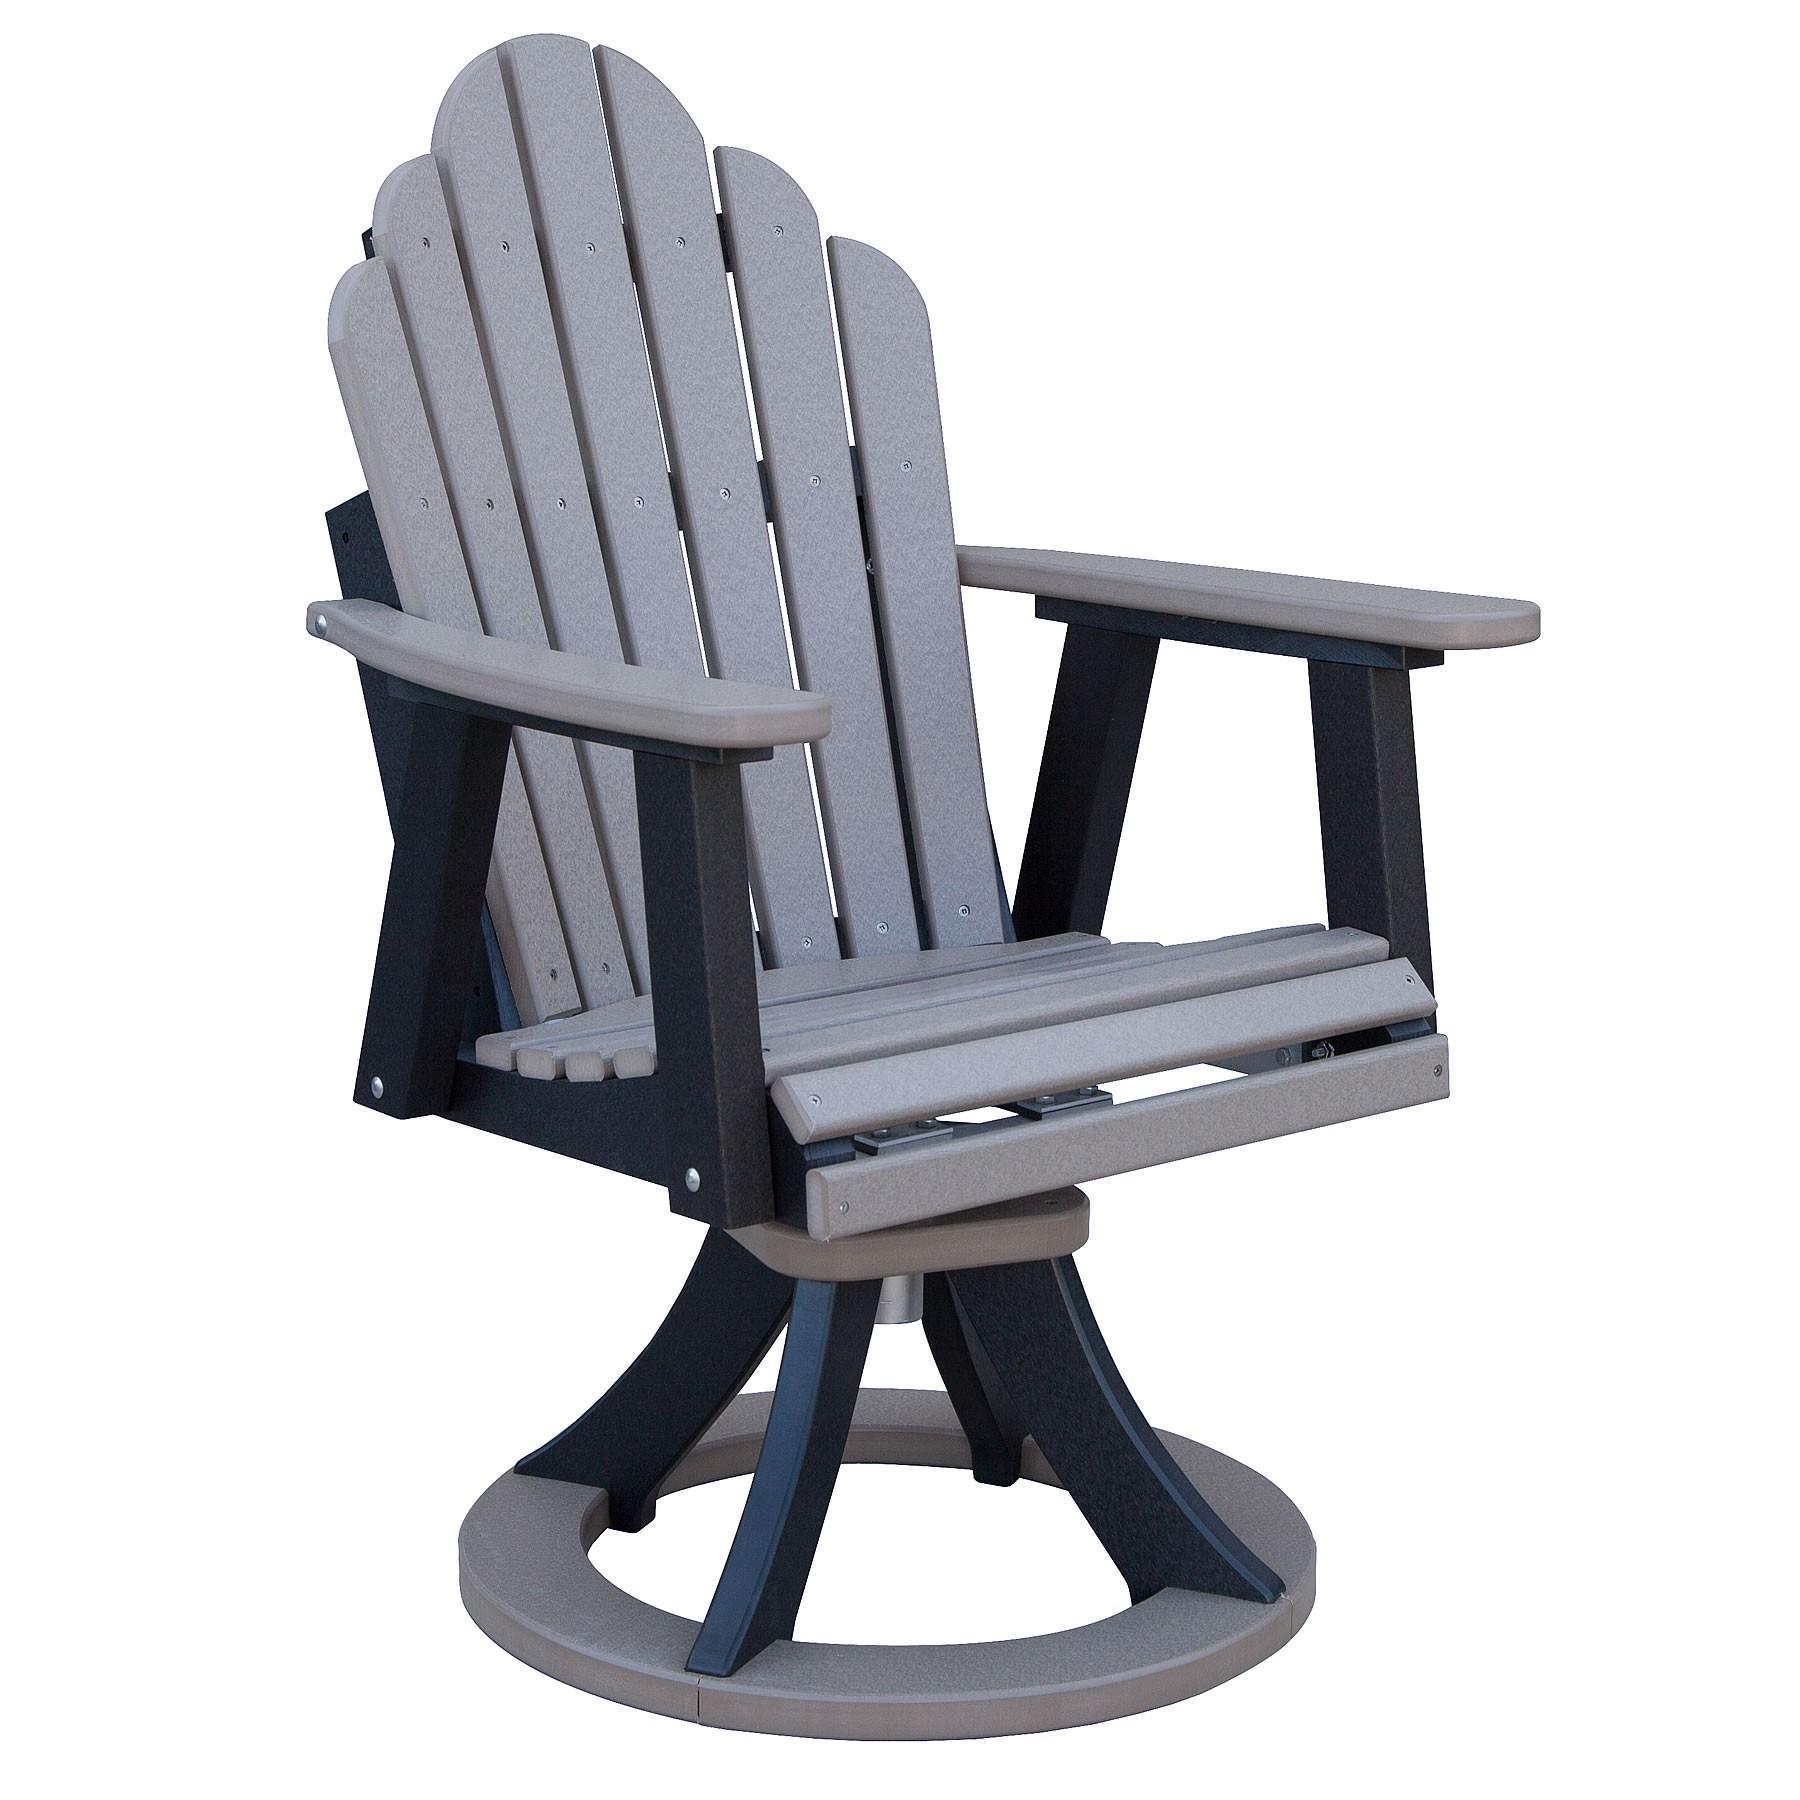 berlin gardens cozi back swivel rocker dining chair. Black Bedroom Furniture Sets. Home Design Ideas